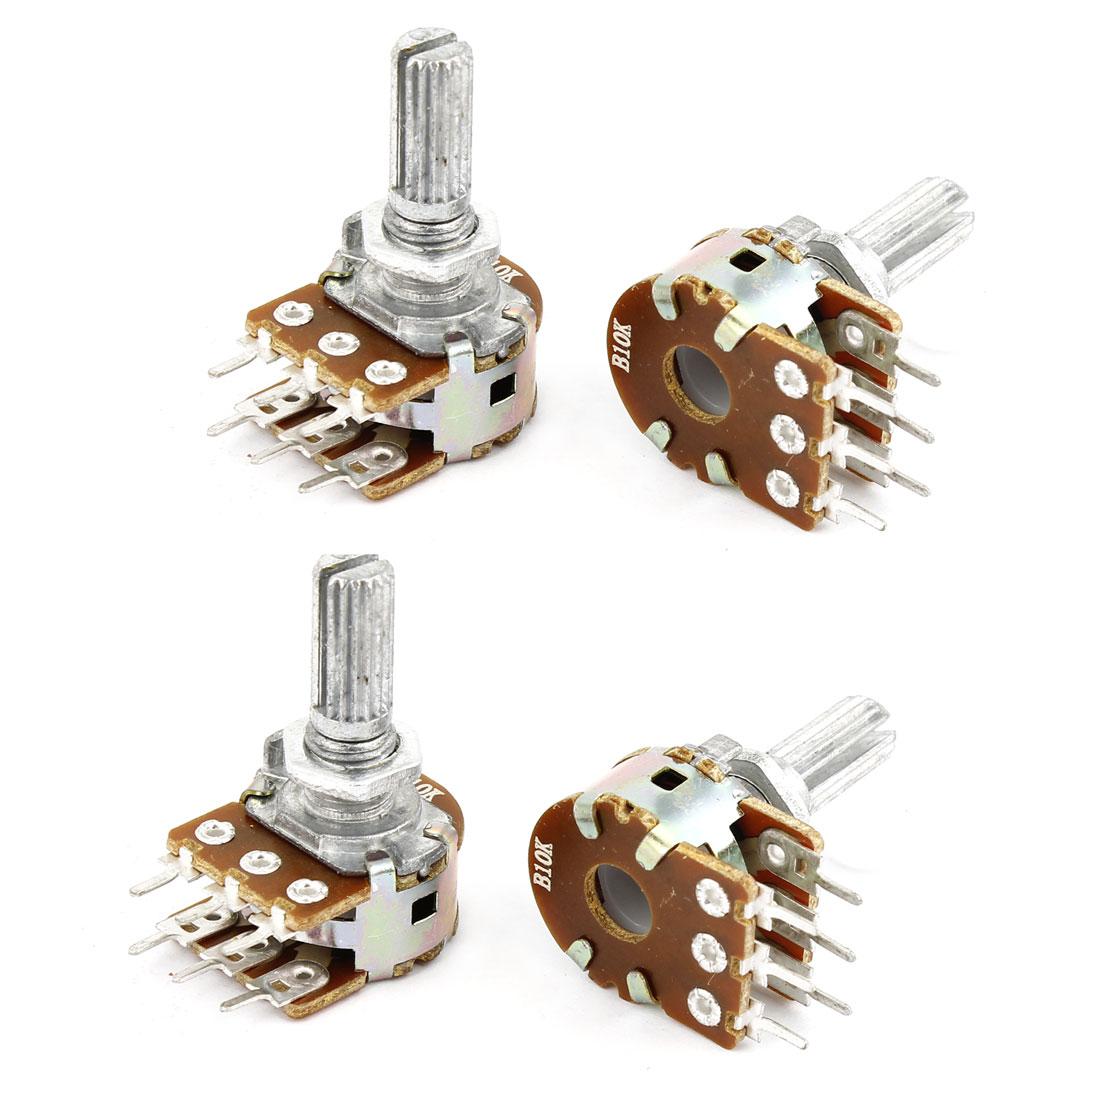 4 Pcs B10K 10K ohm 6 Pins Split Shaft Rotary Linear Dual Taper Carbon Film Potentiometer